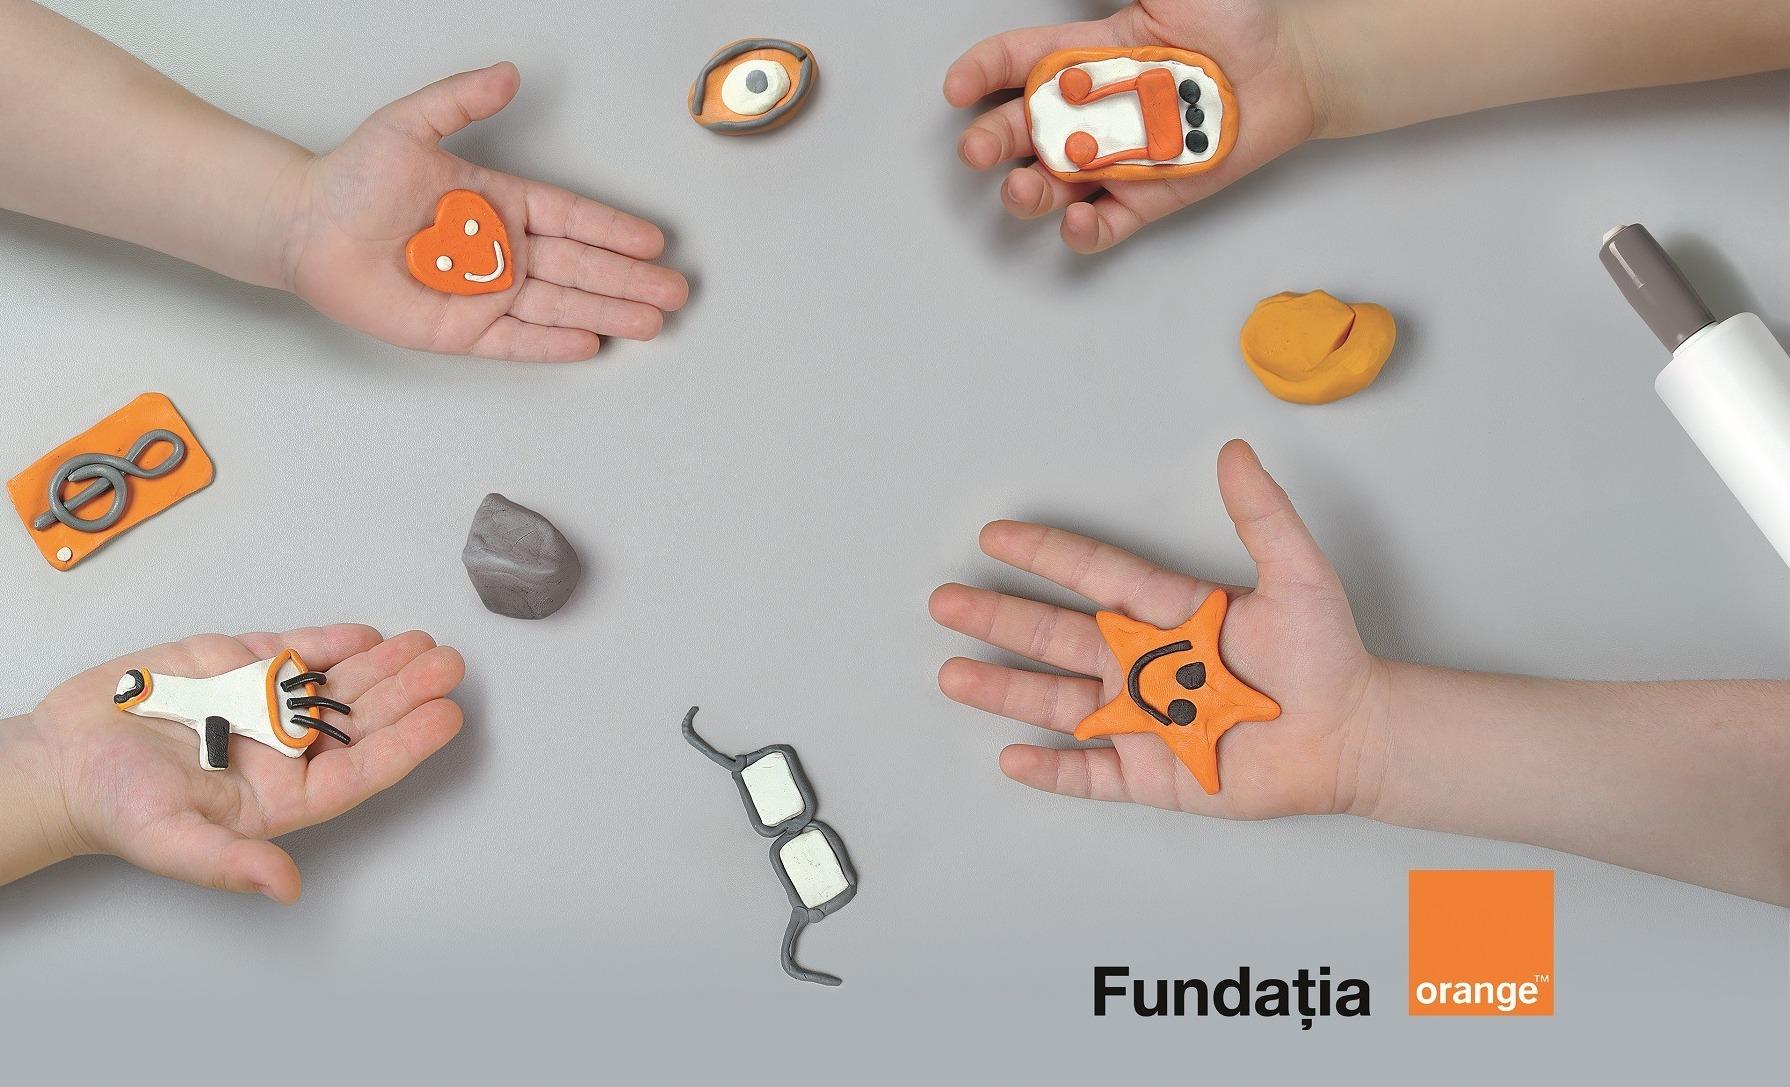 Fundația Orange